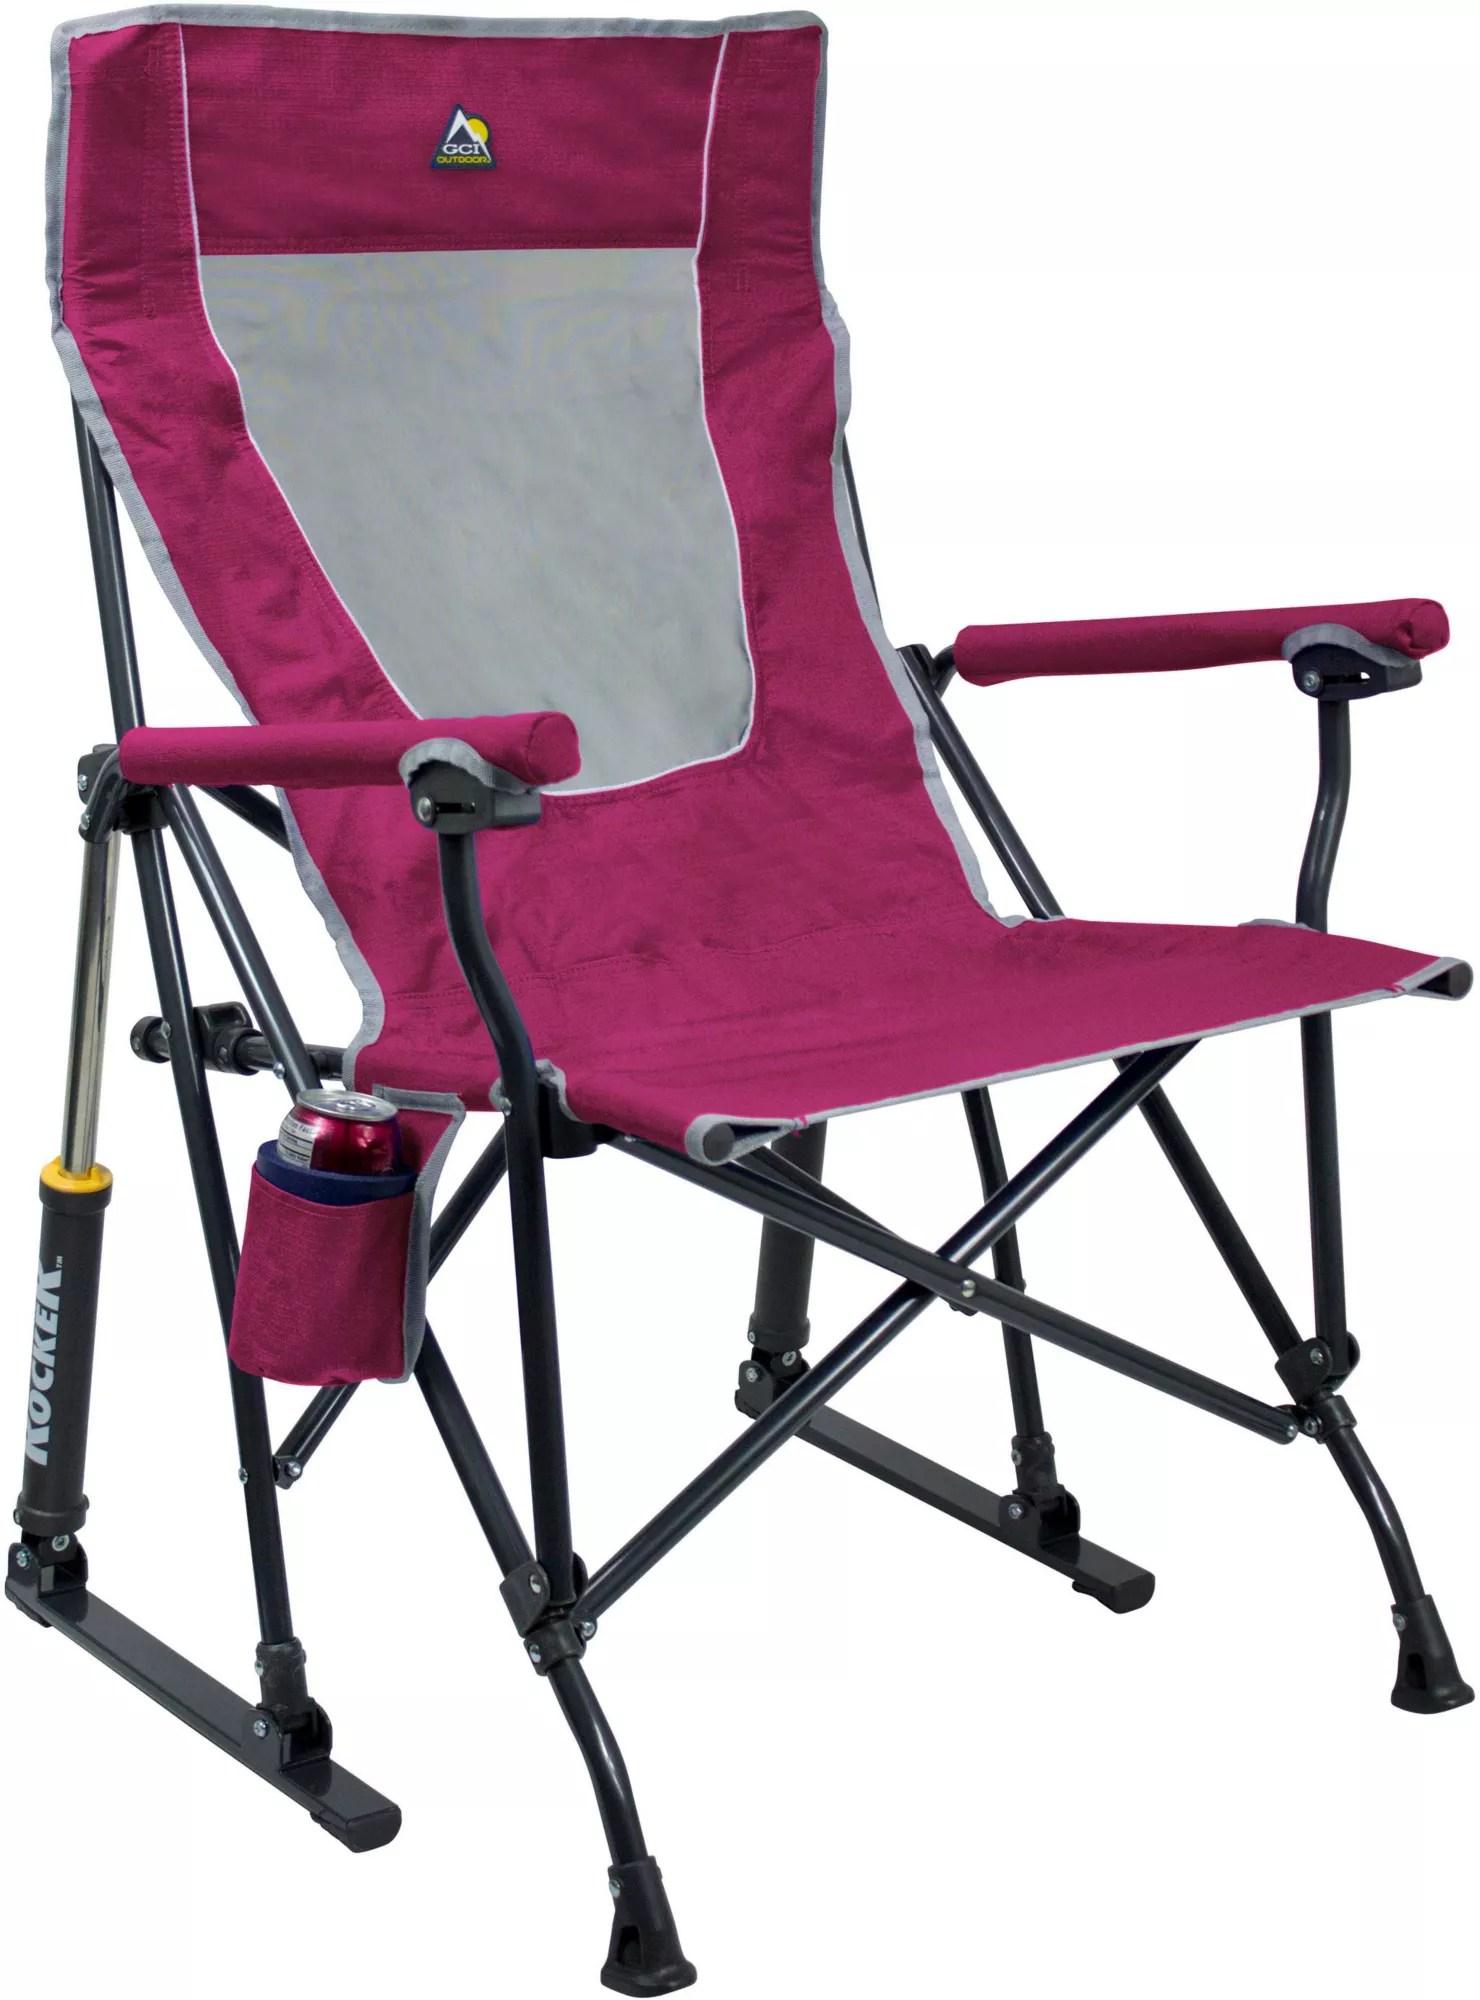 rocker outdoor chairs trex rocking gci freestyle chair dick s sporting goods roadtrip